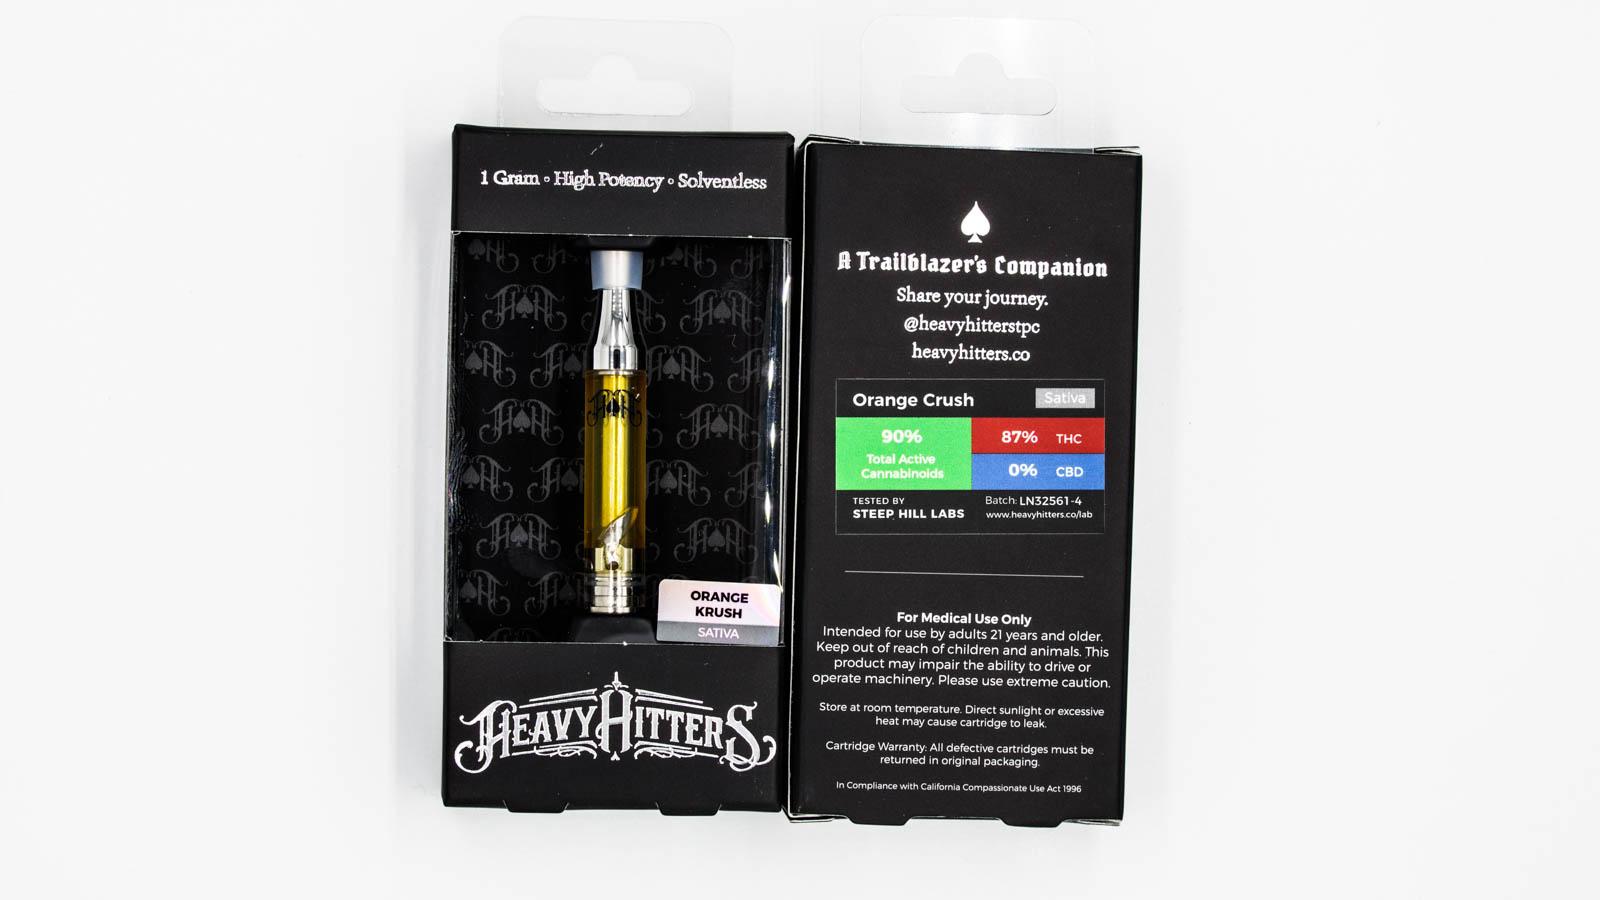 Heavy Hitters - Cartridge Orange Krush 1g | Goldn Bloom